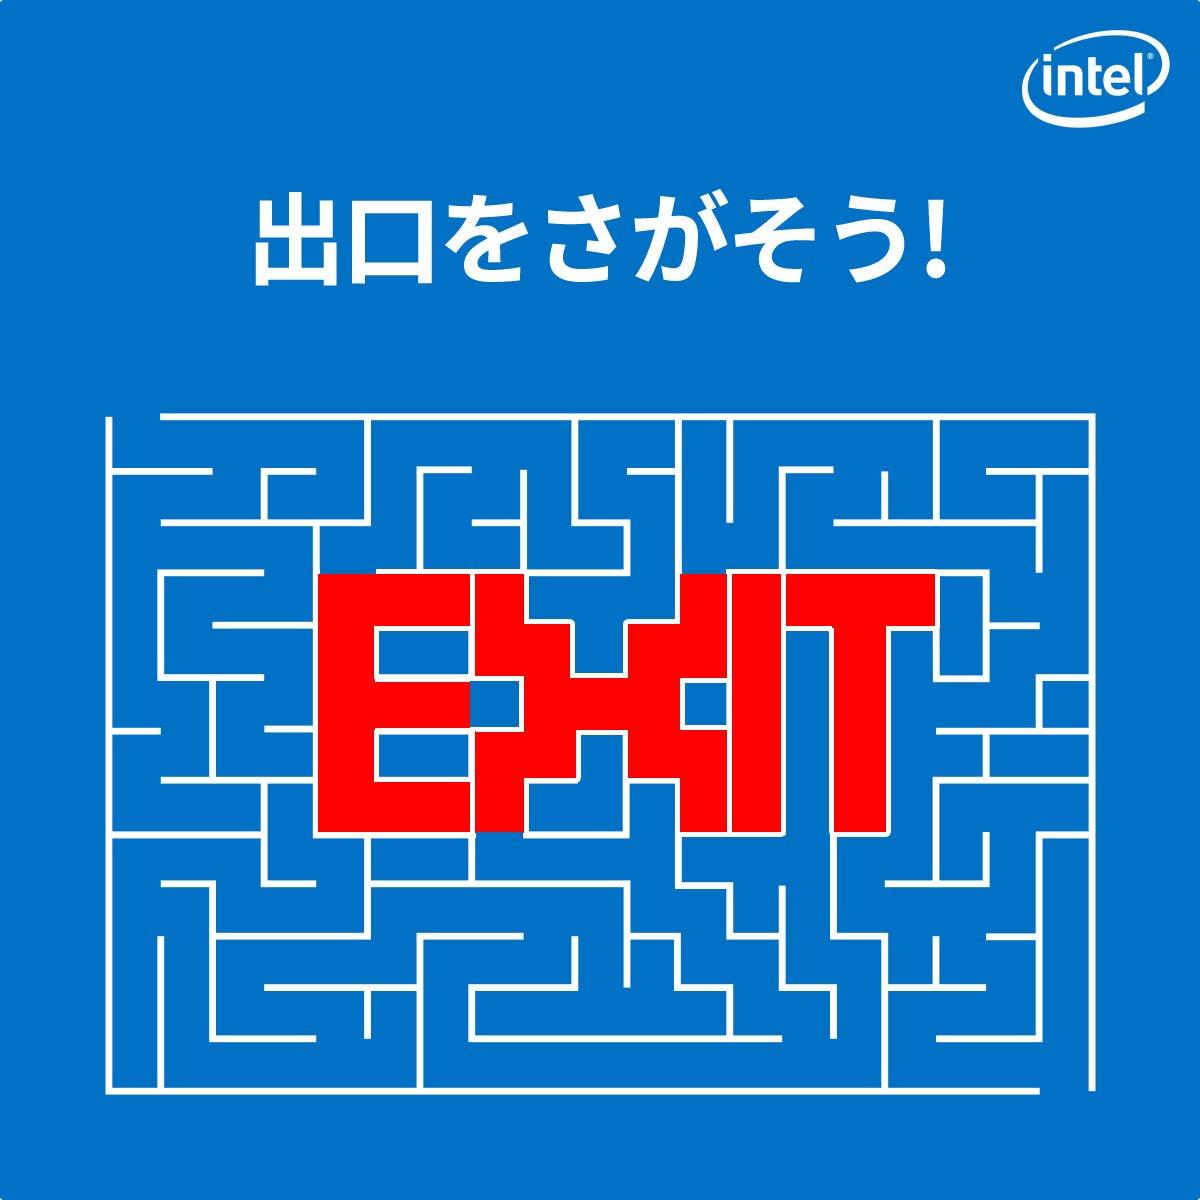 Intel_3-3answer